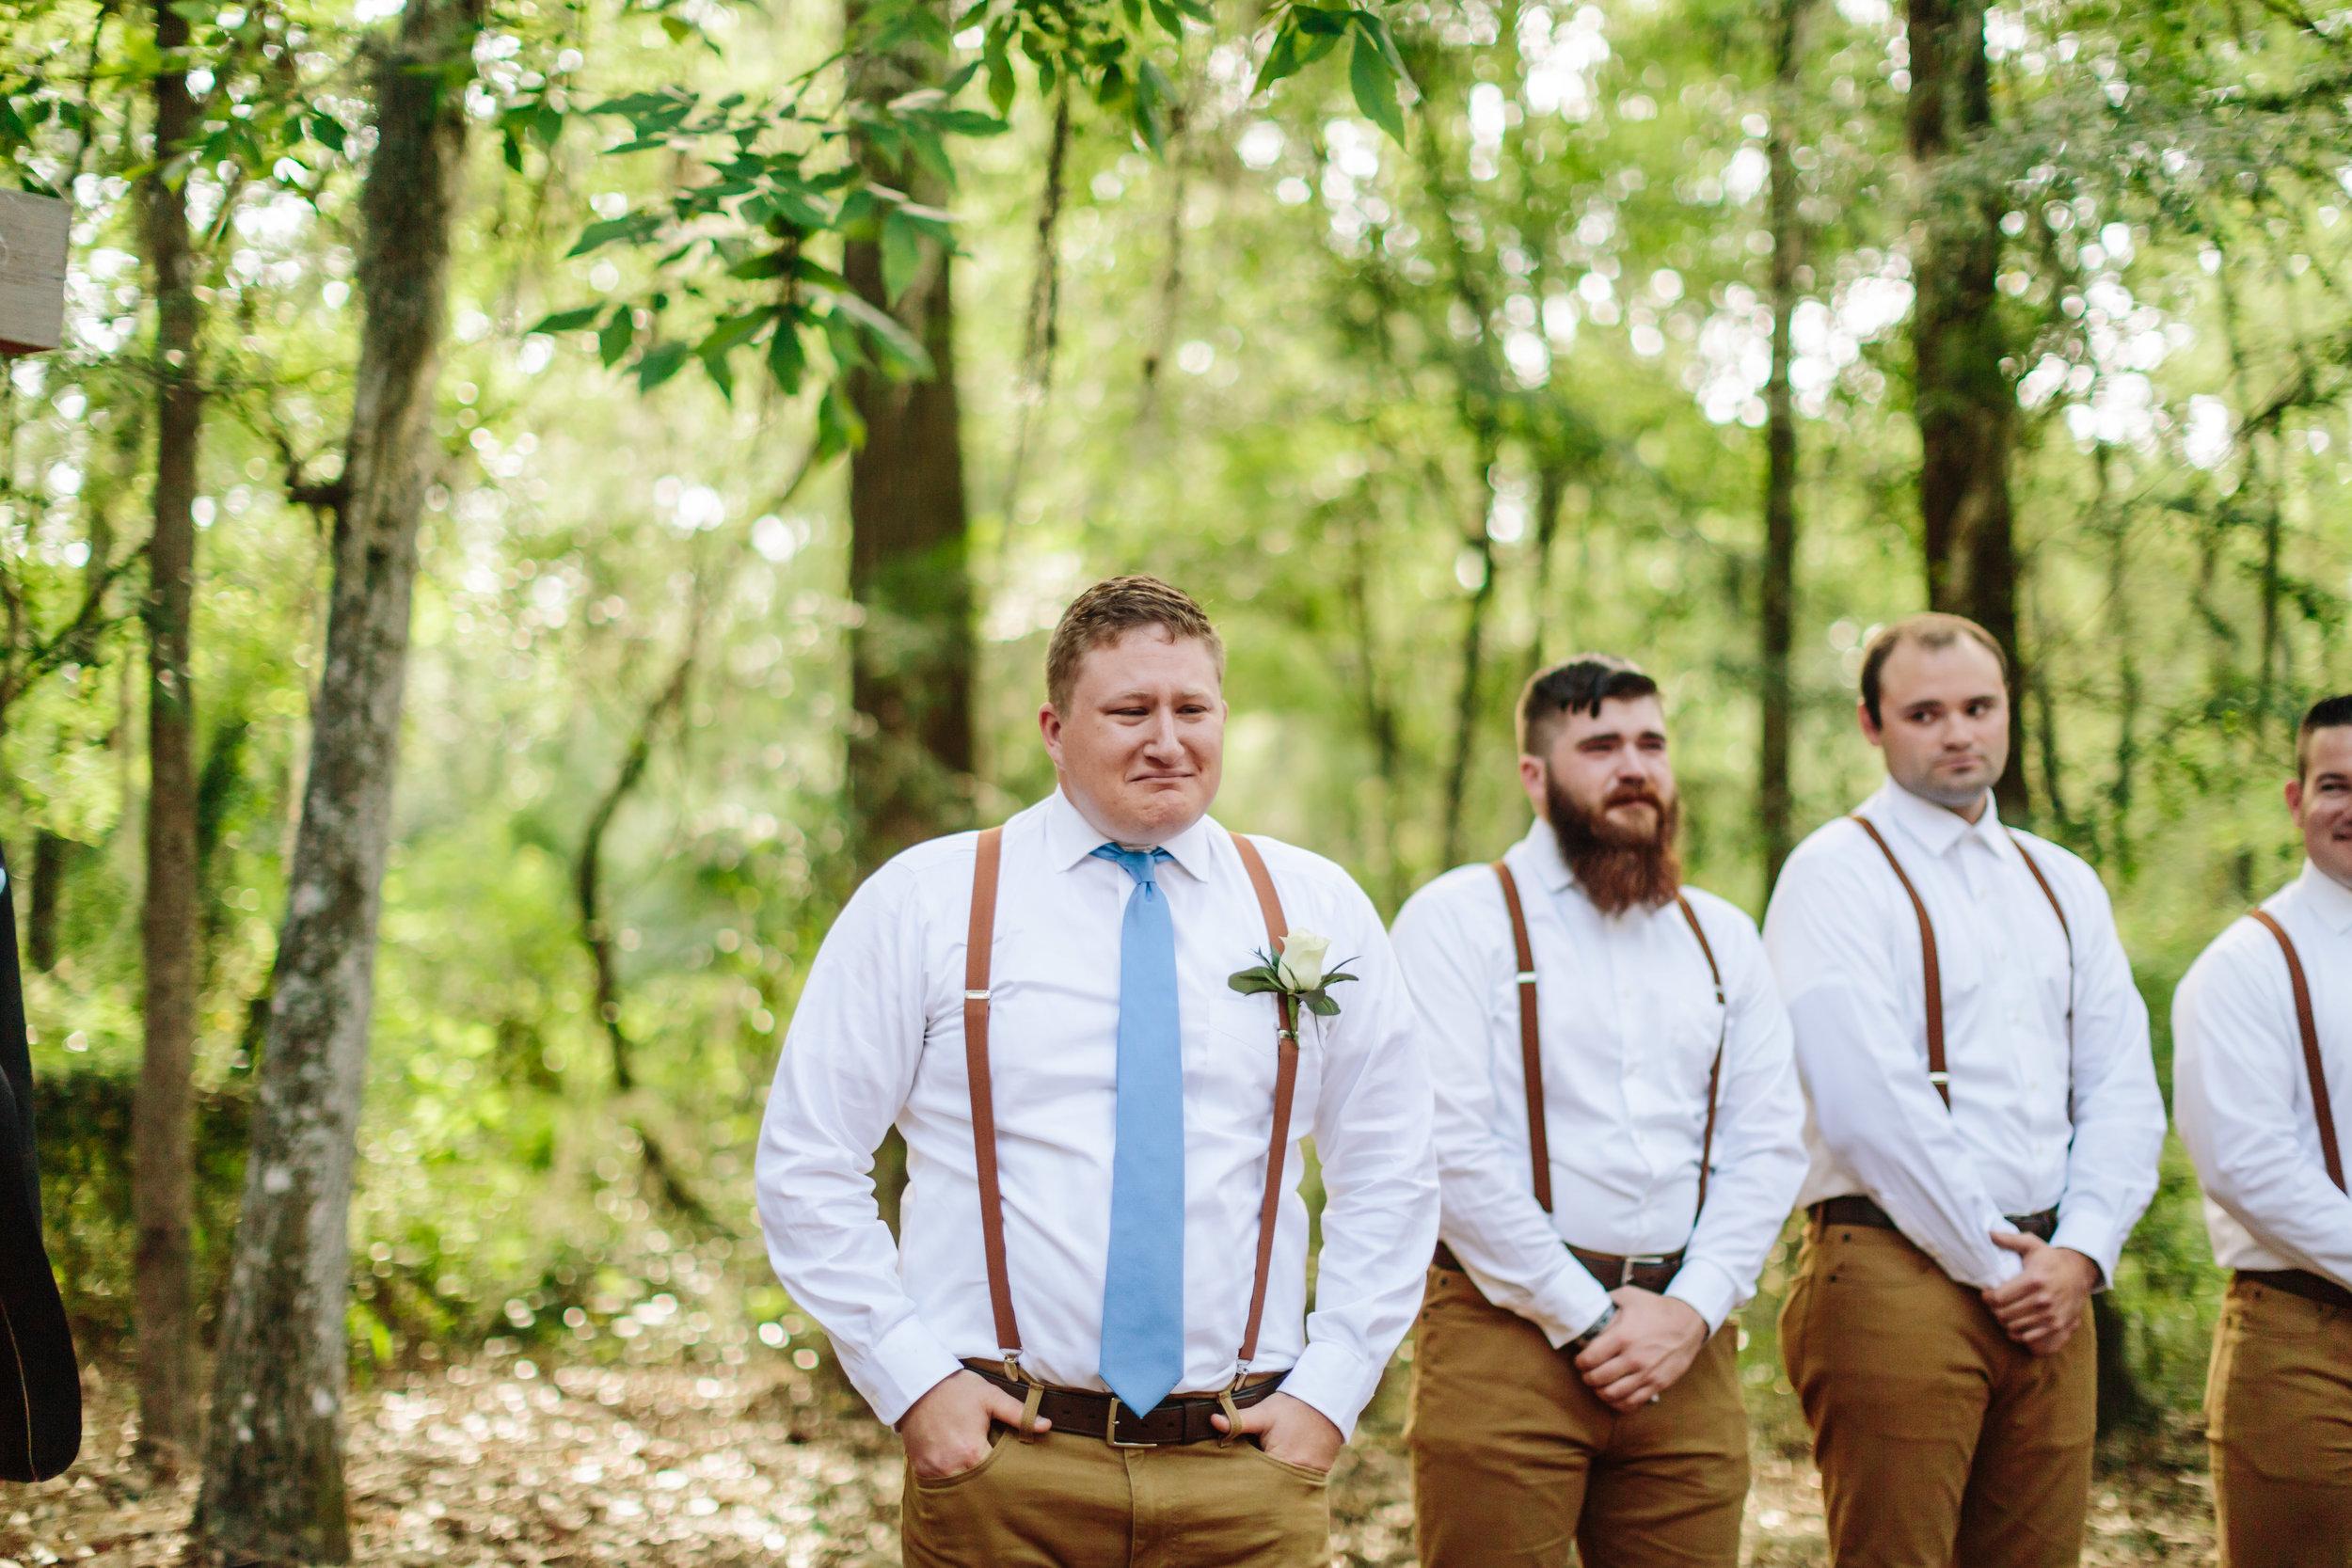 Griffin Wedding October Oaks Farm-308.jpg